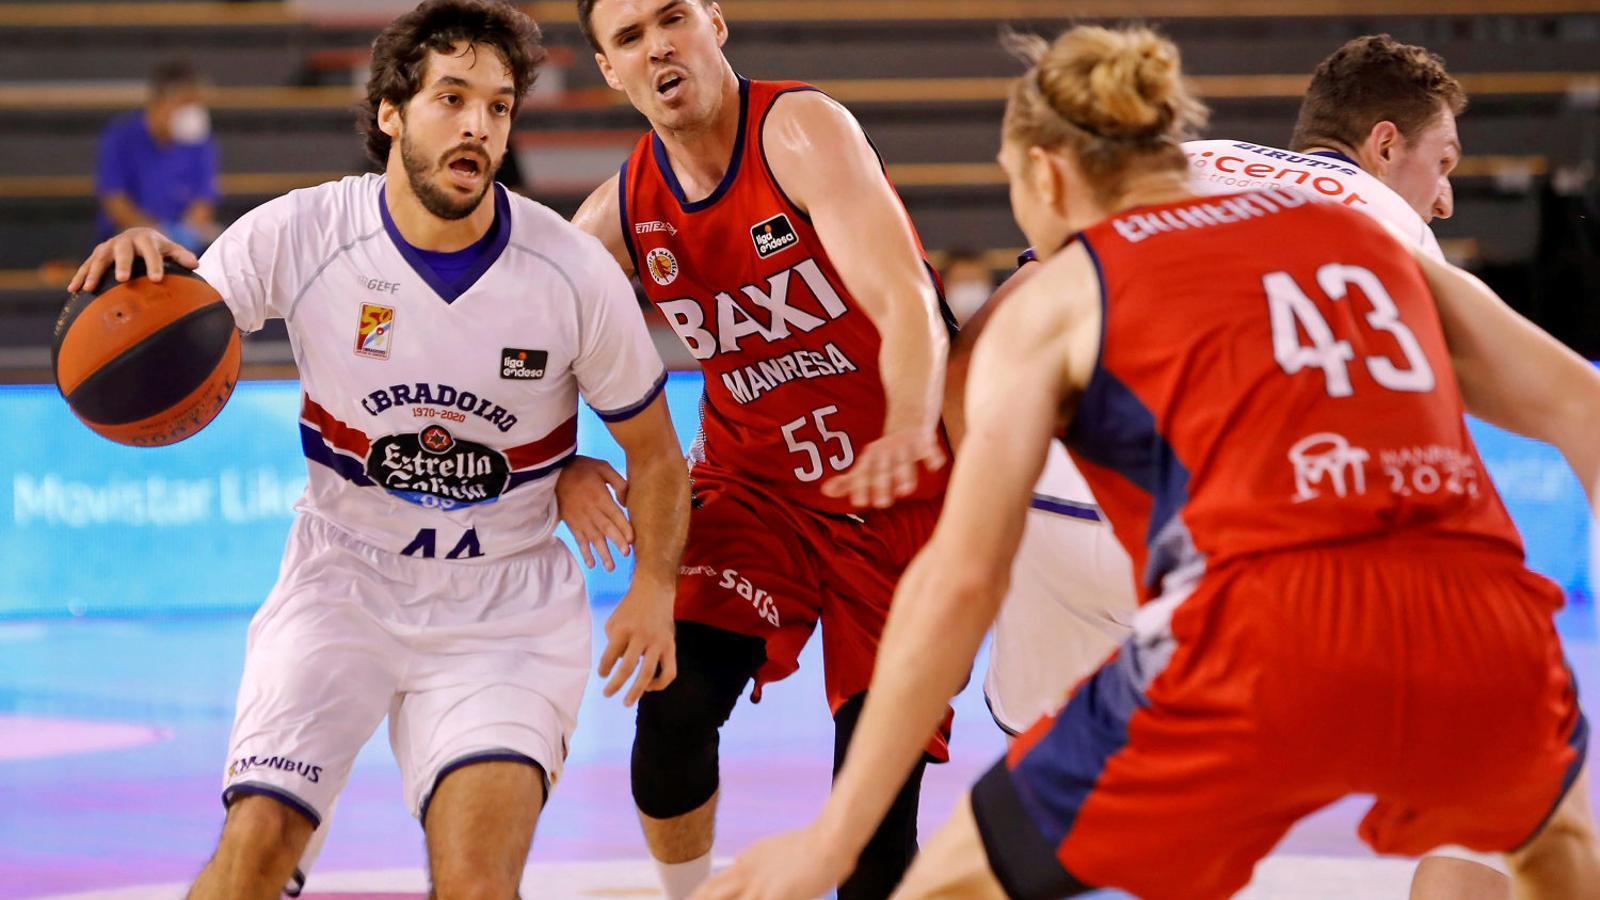 Pepe Pozas i Dani Pérez durant el partit.